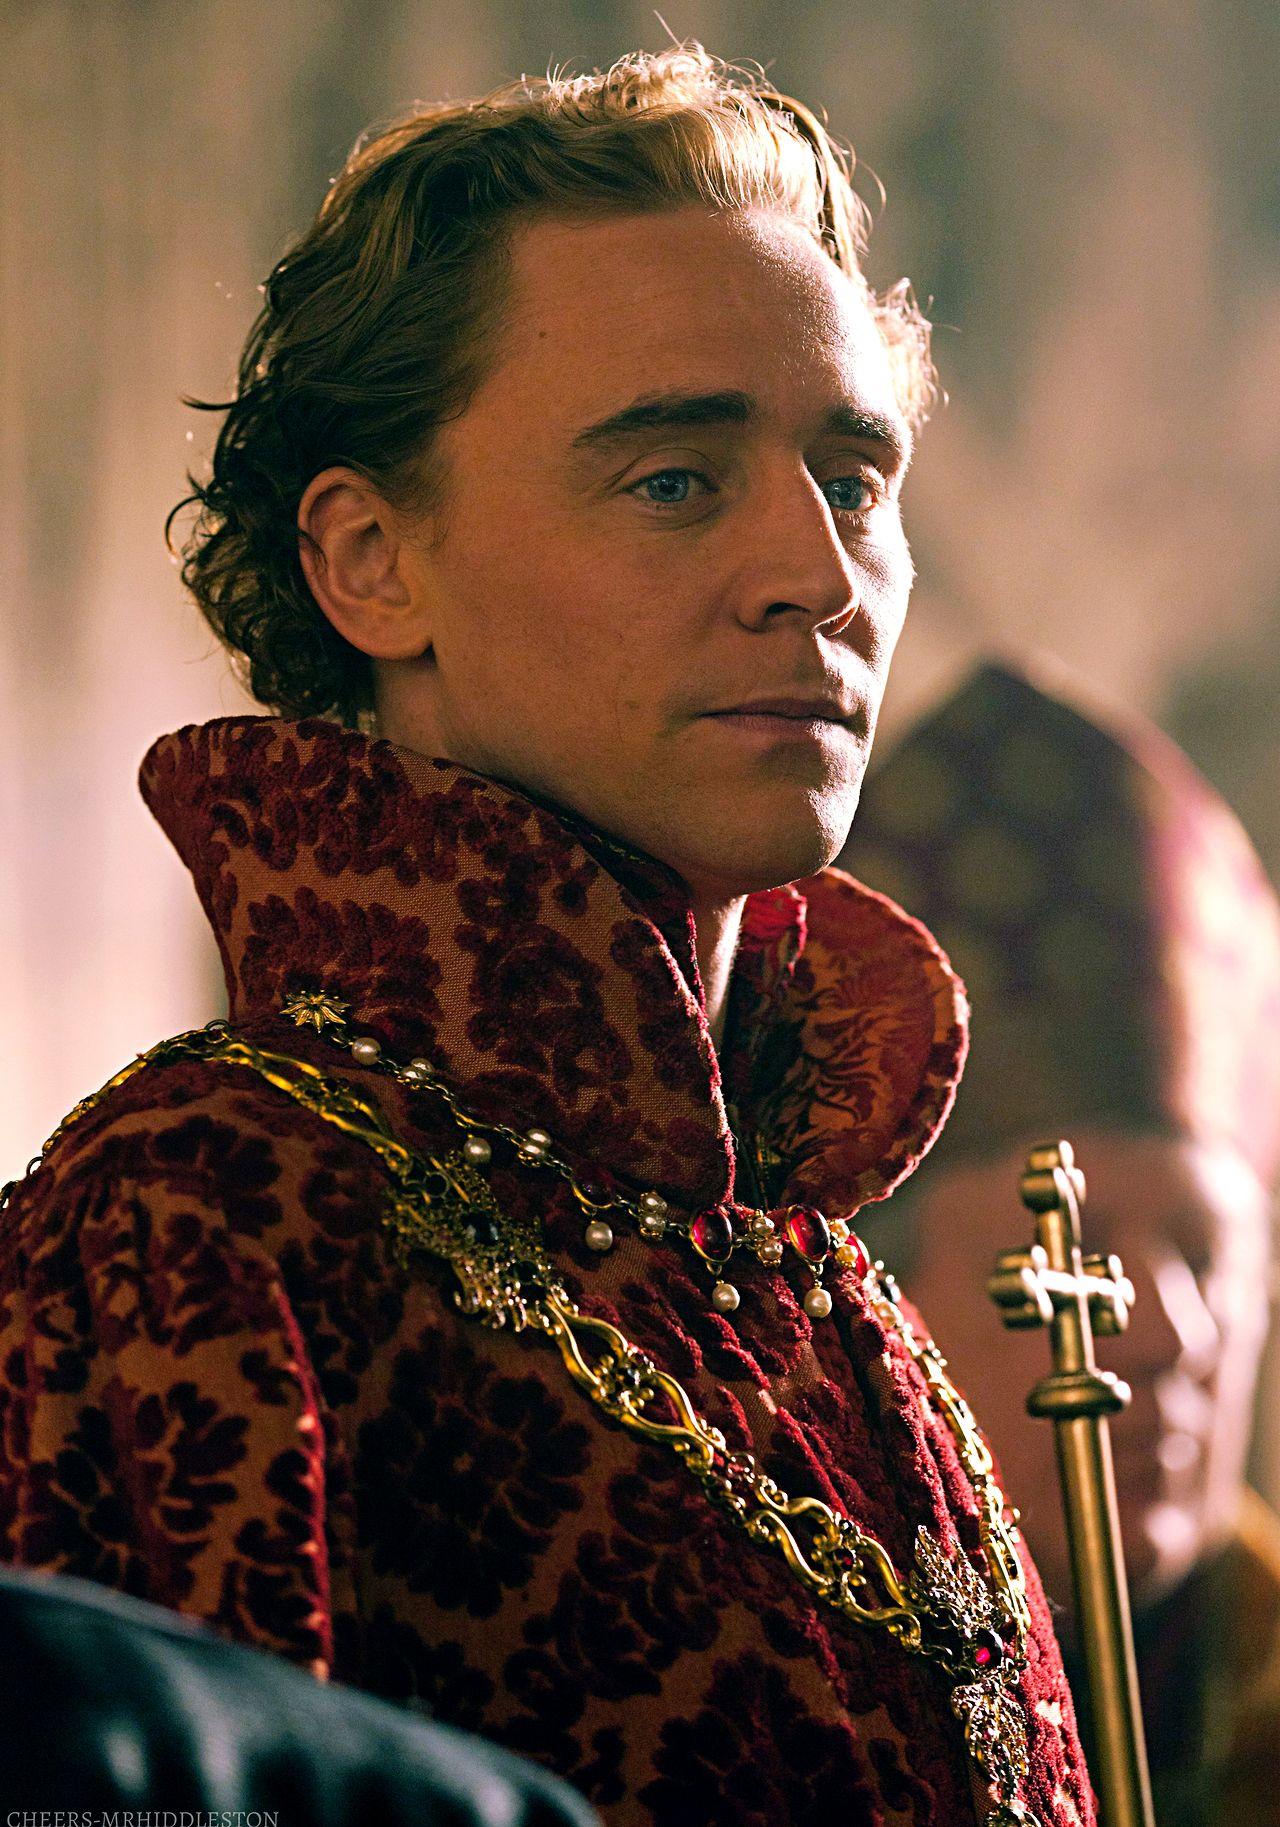 The Coronation of King Henry V.